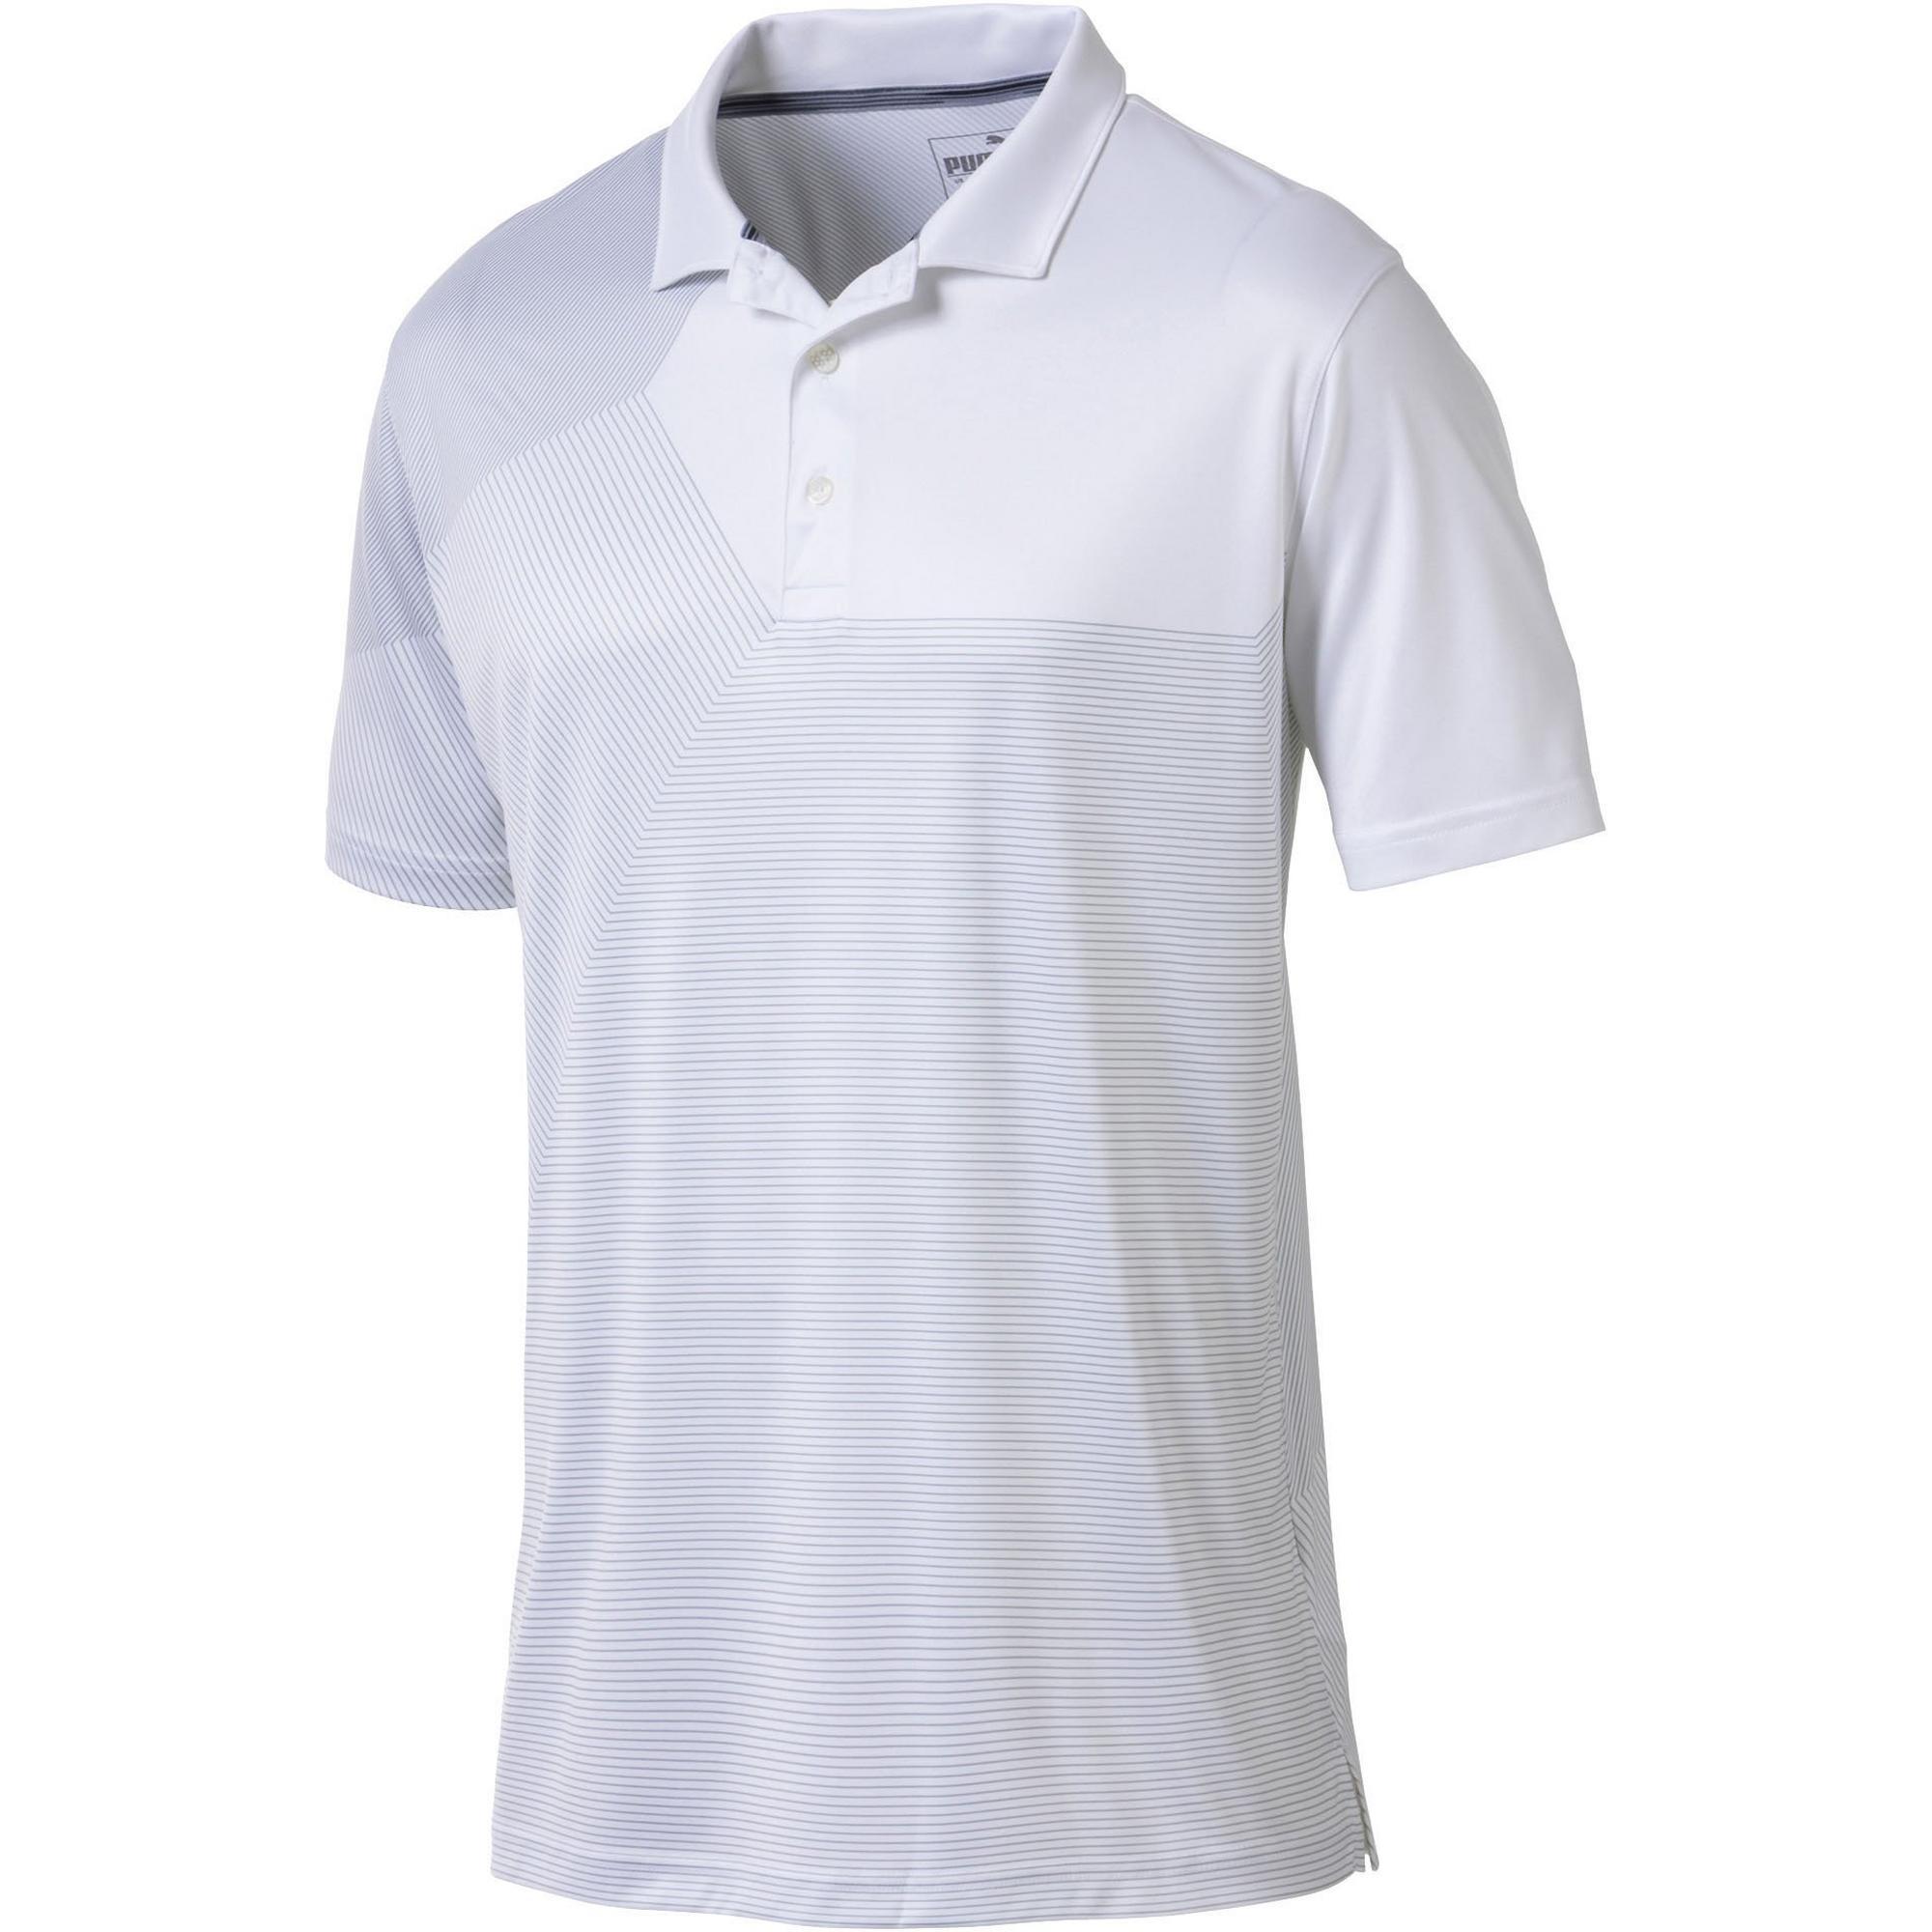 Men's PWRCOOL Dassler Short Sleeve Polo